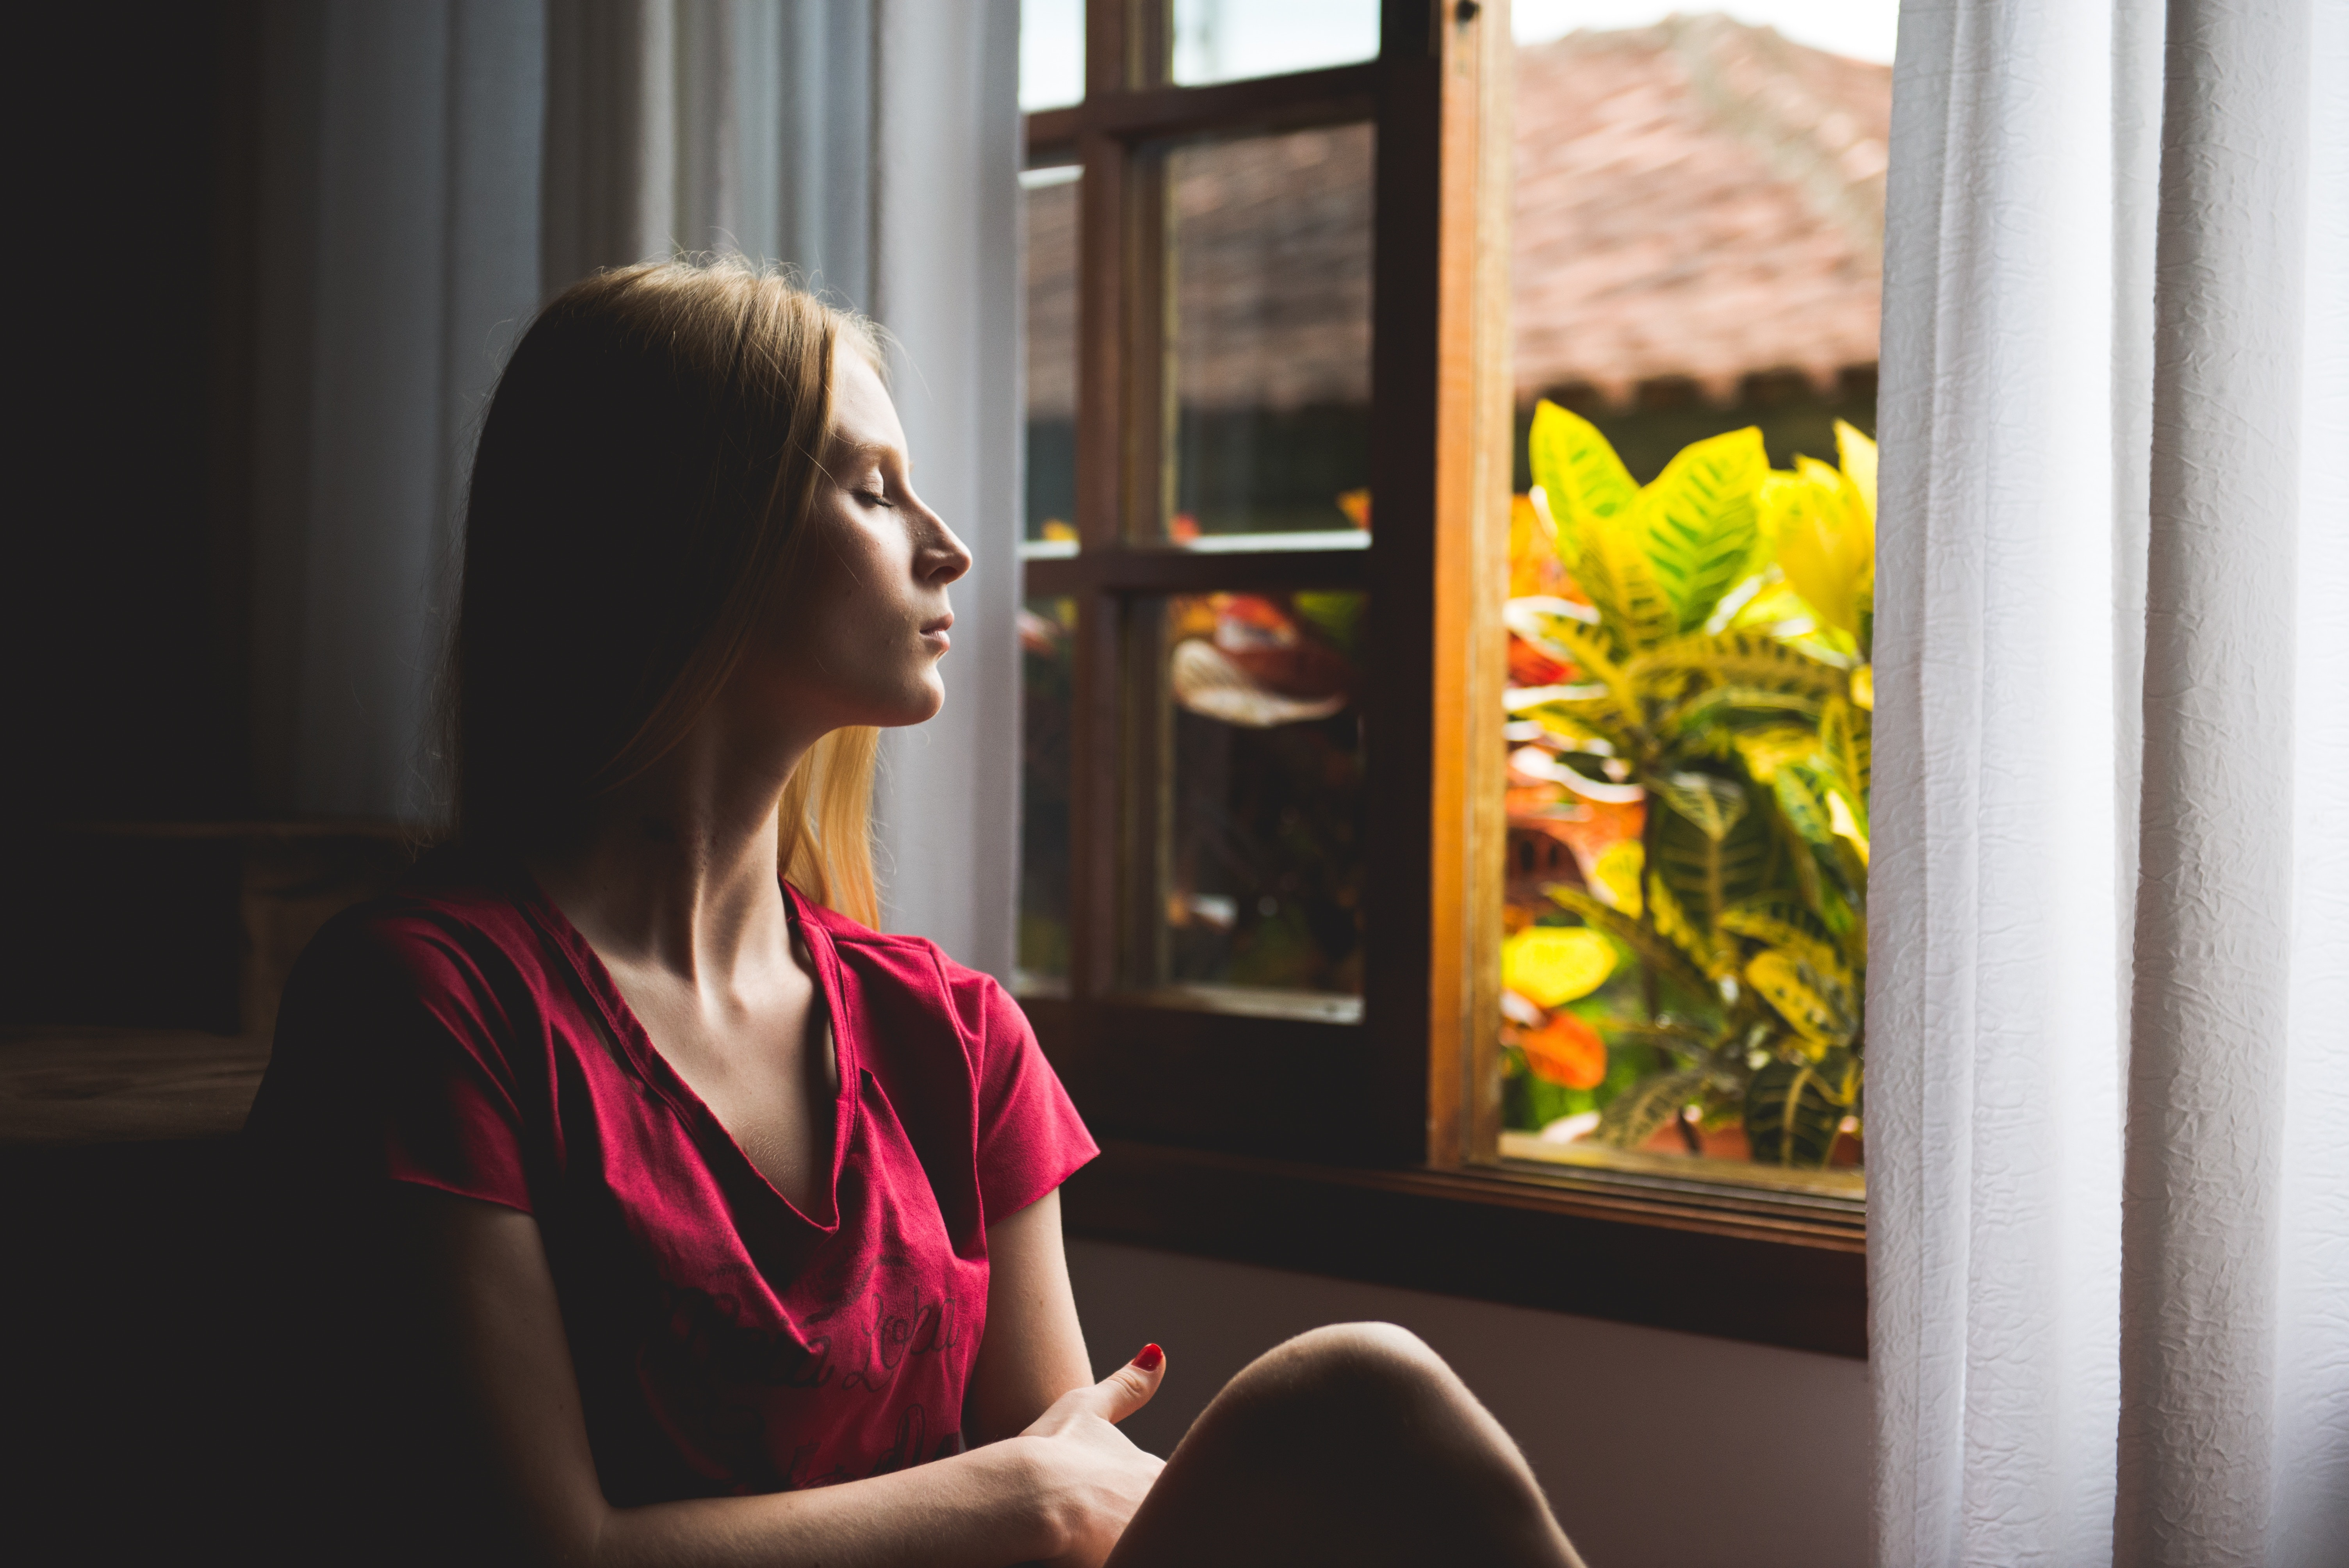 Самообвинение и самокритика: 5 стратегий преодоления